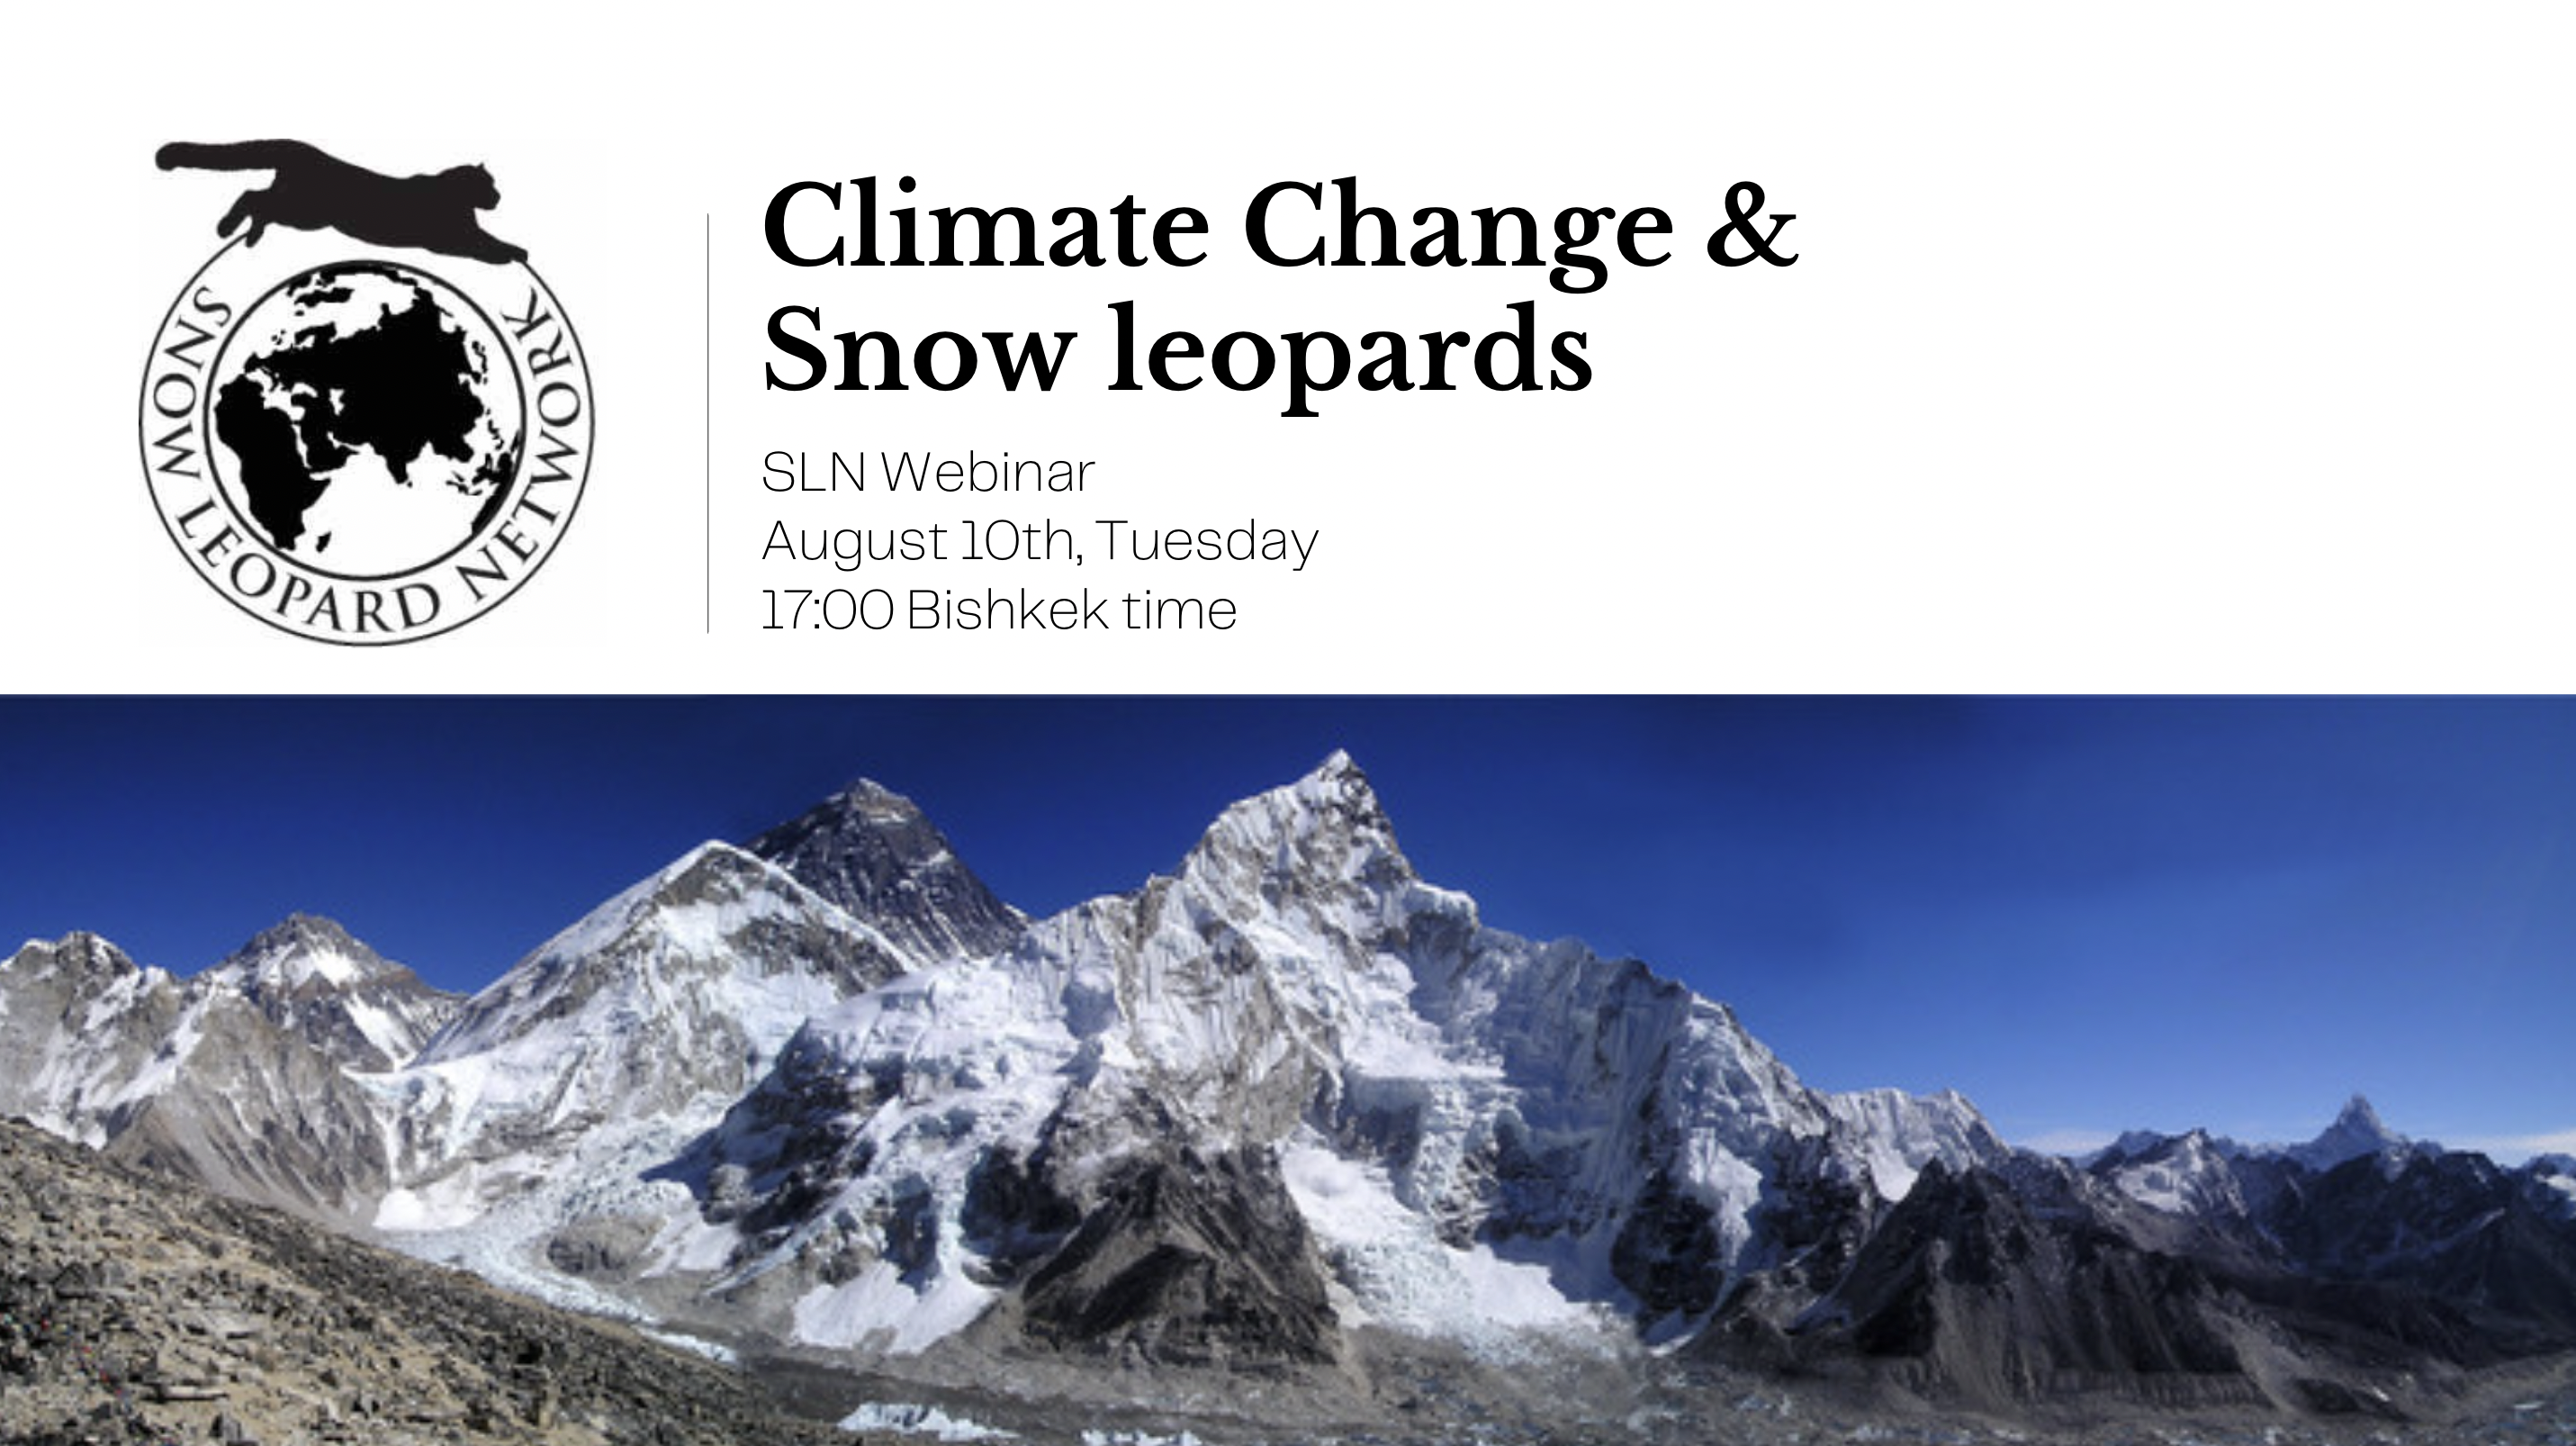 SLN Webinar: Climate Change & Snow Leopards